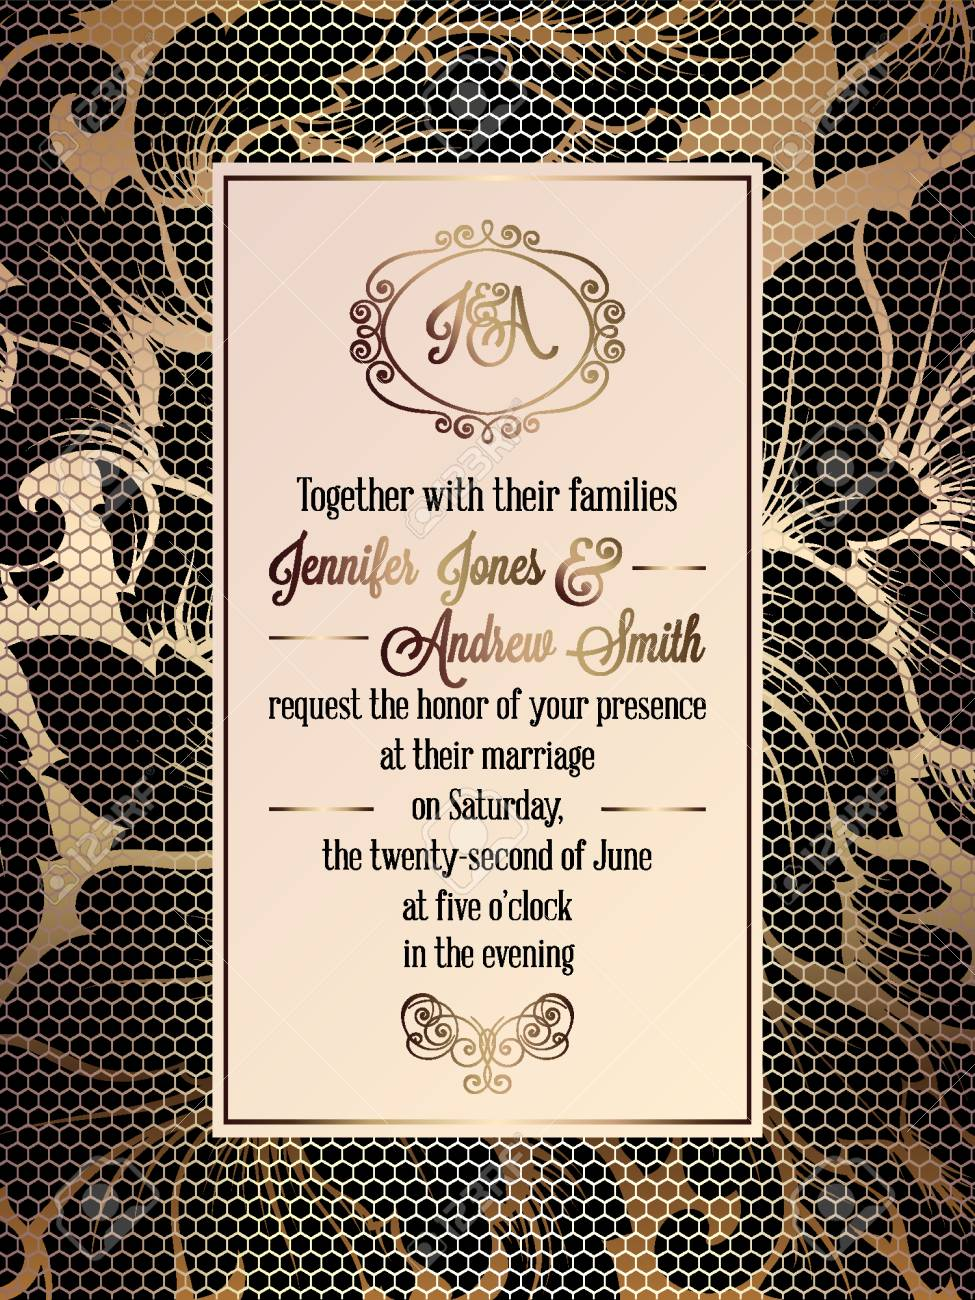 Vintage baroque style wedding invitation card template elegant 81896371 vintage baroque style wedding invitation card template elegant formal design with damask background g stopboris Gallery